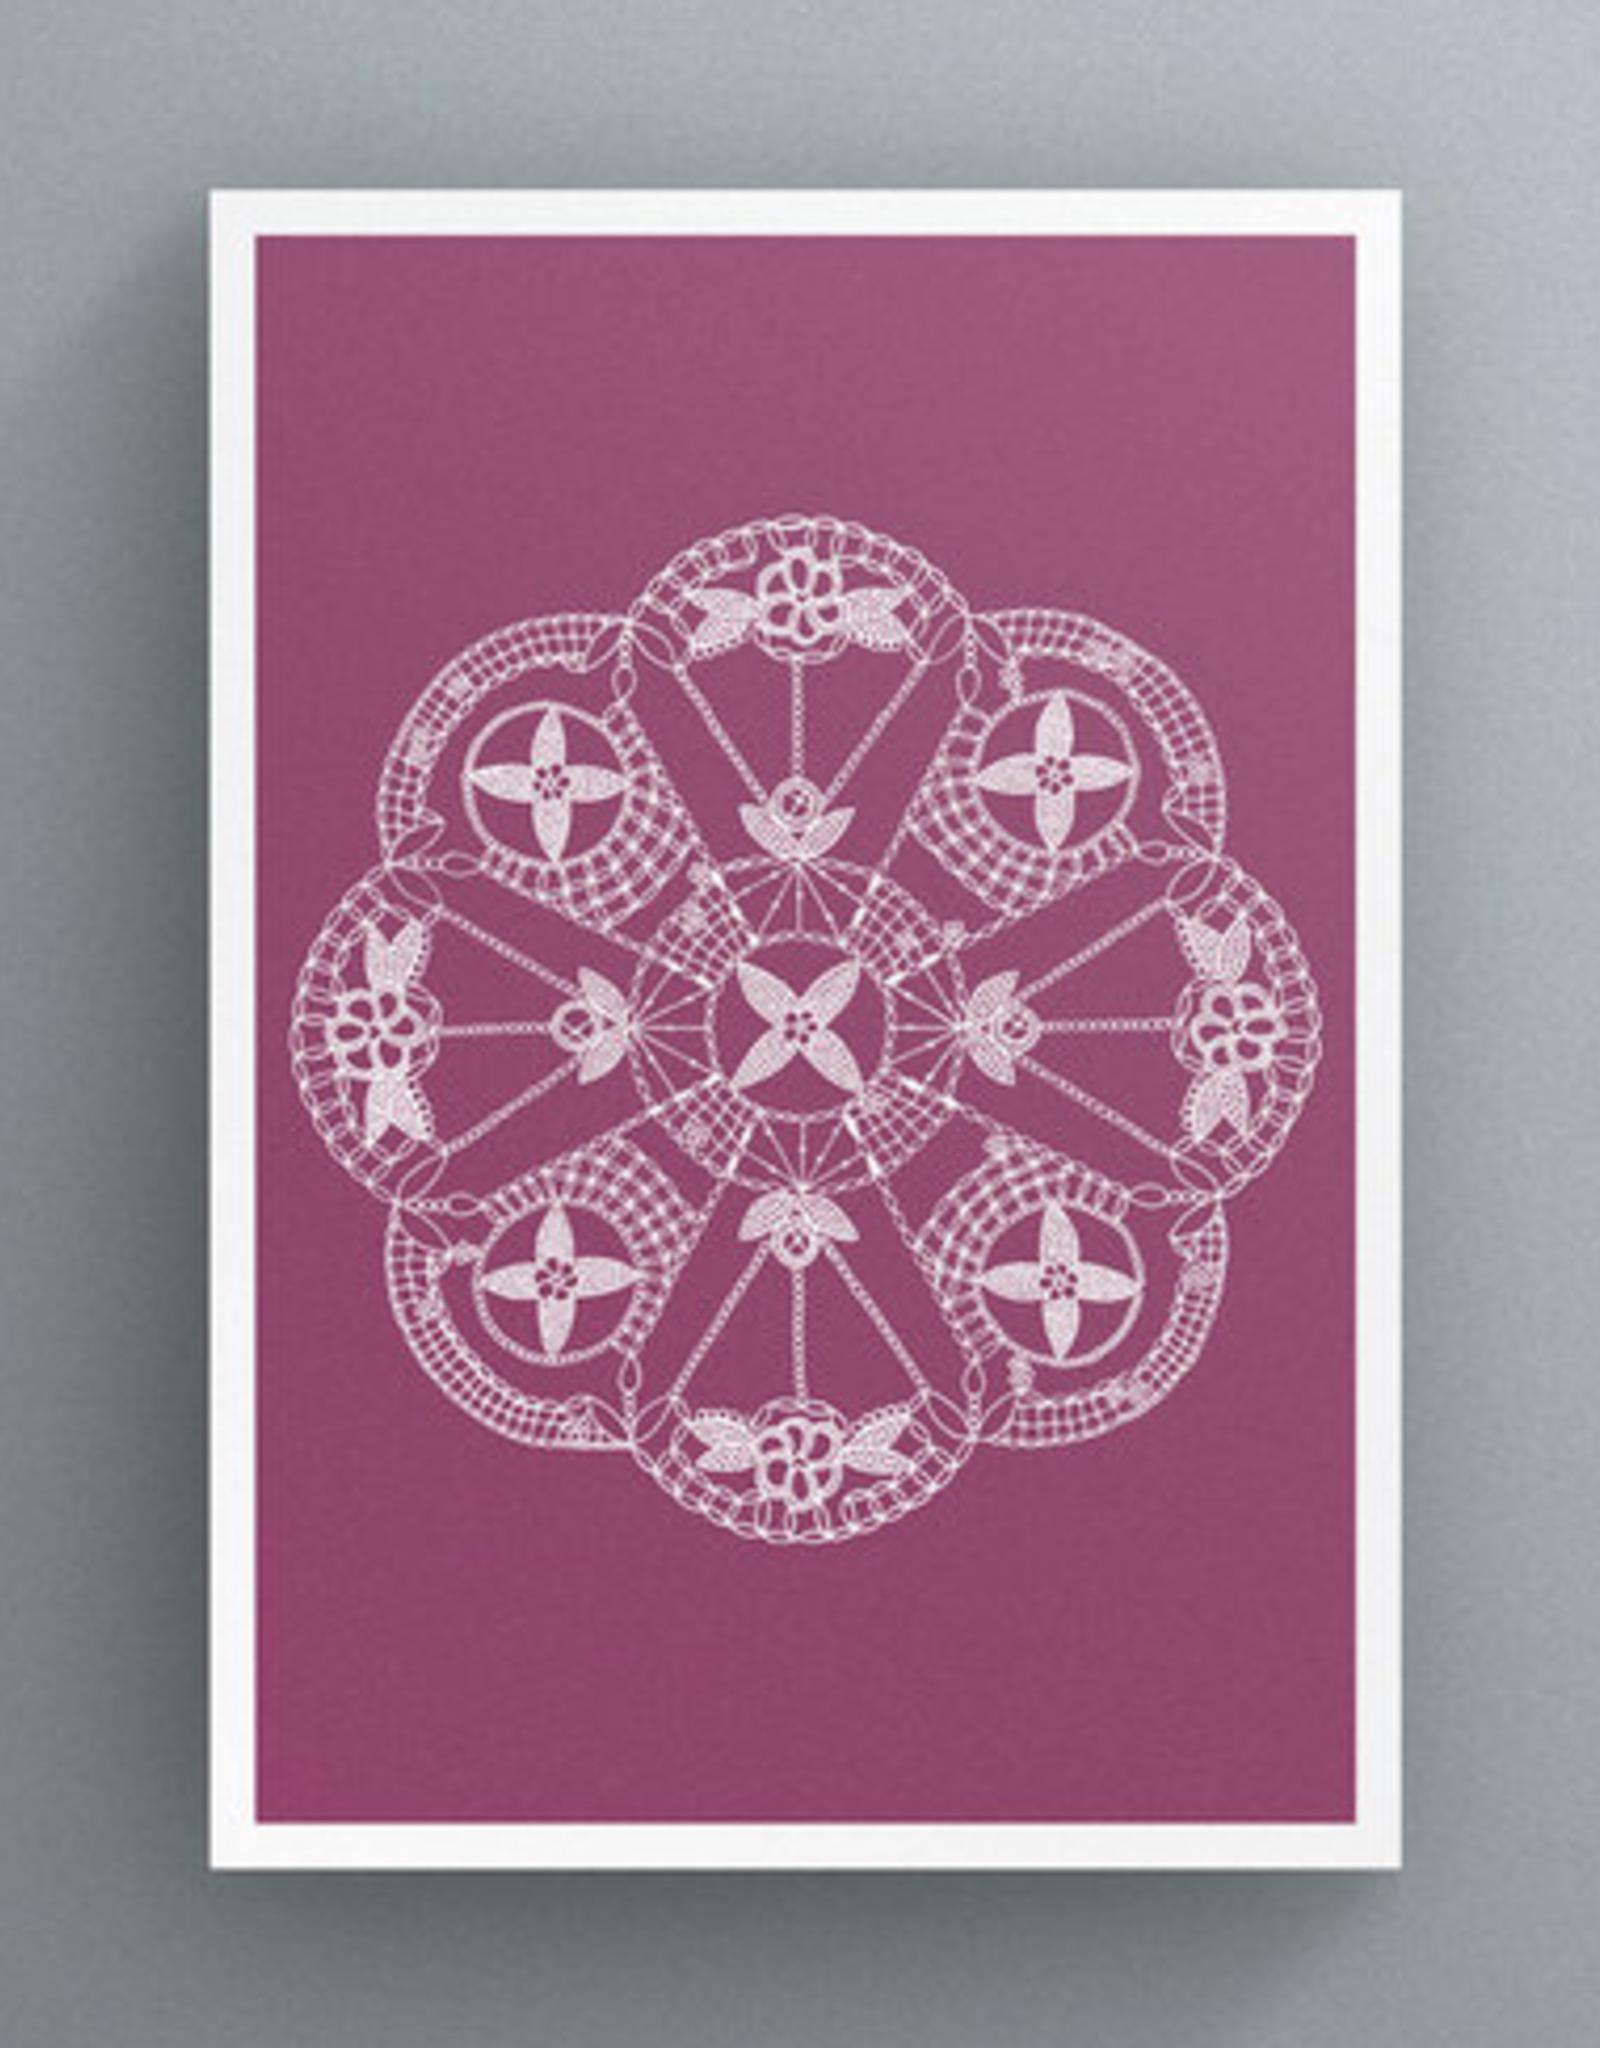 Petal to Petal Irish Lace - Greeting Card